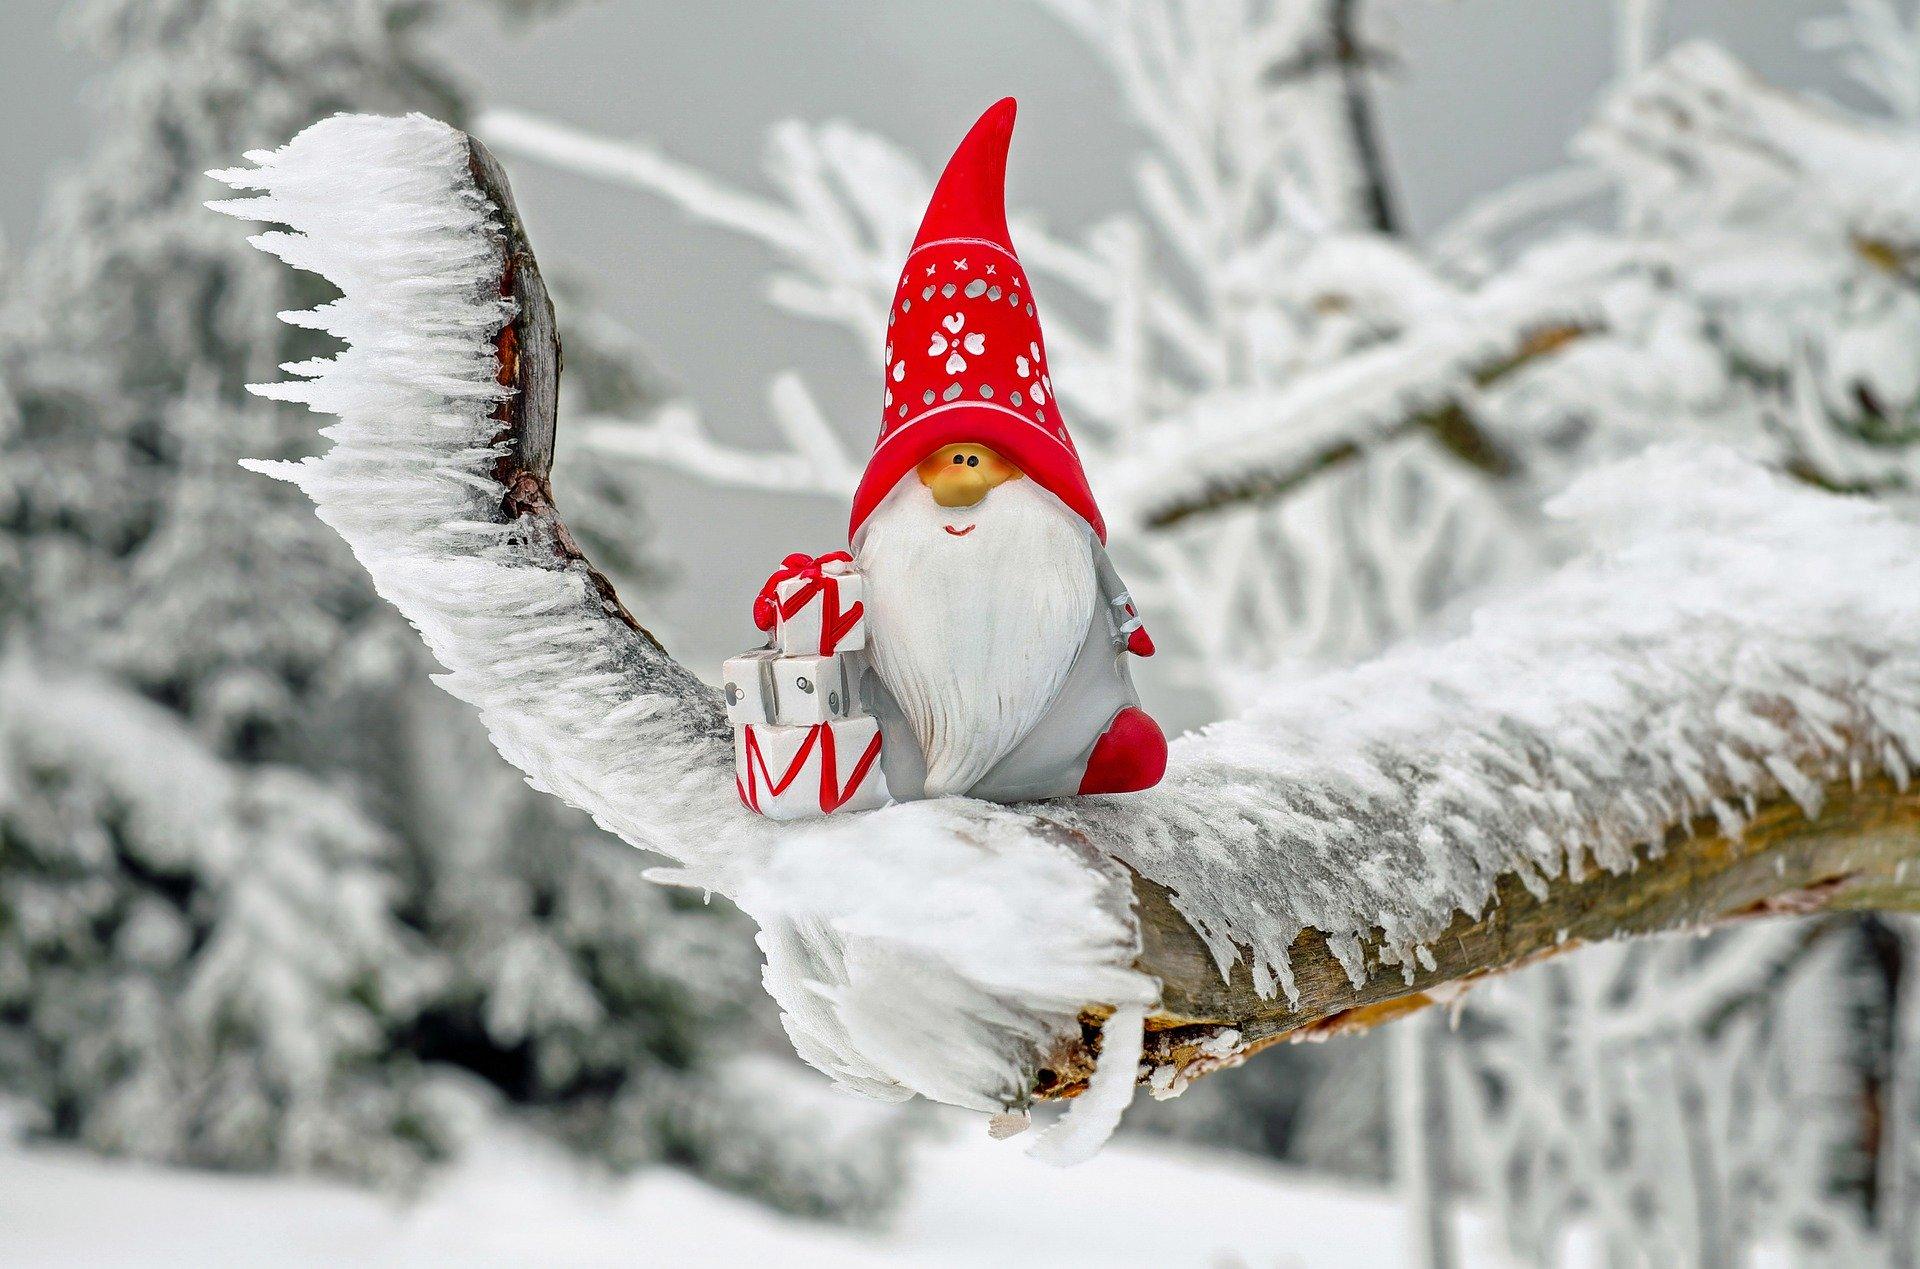 Mercatini di Natale di Pergine Valsugana